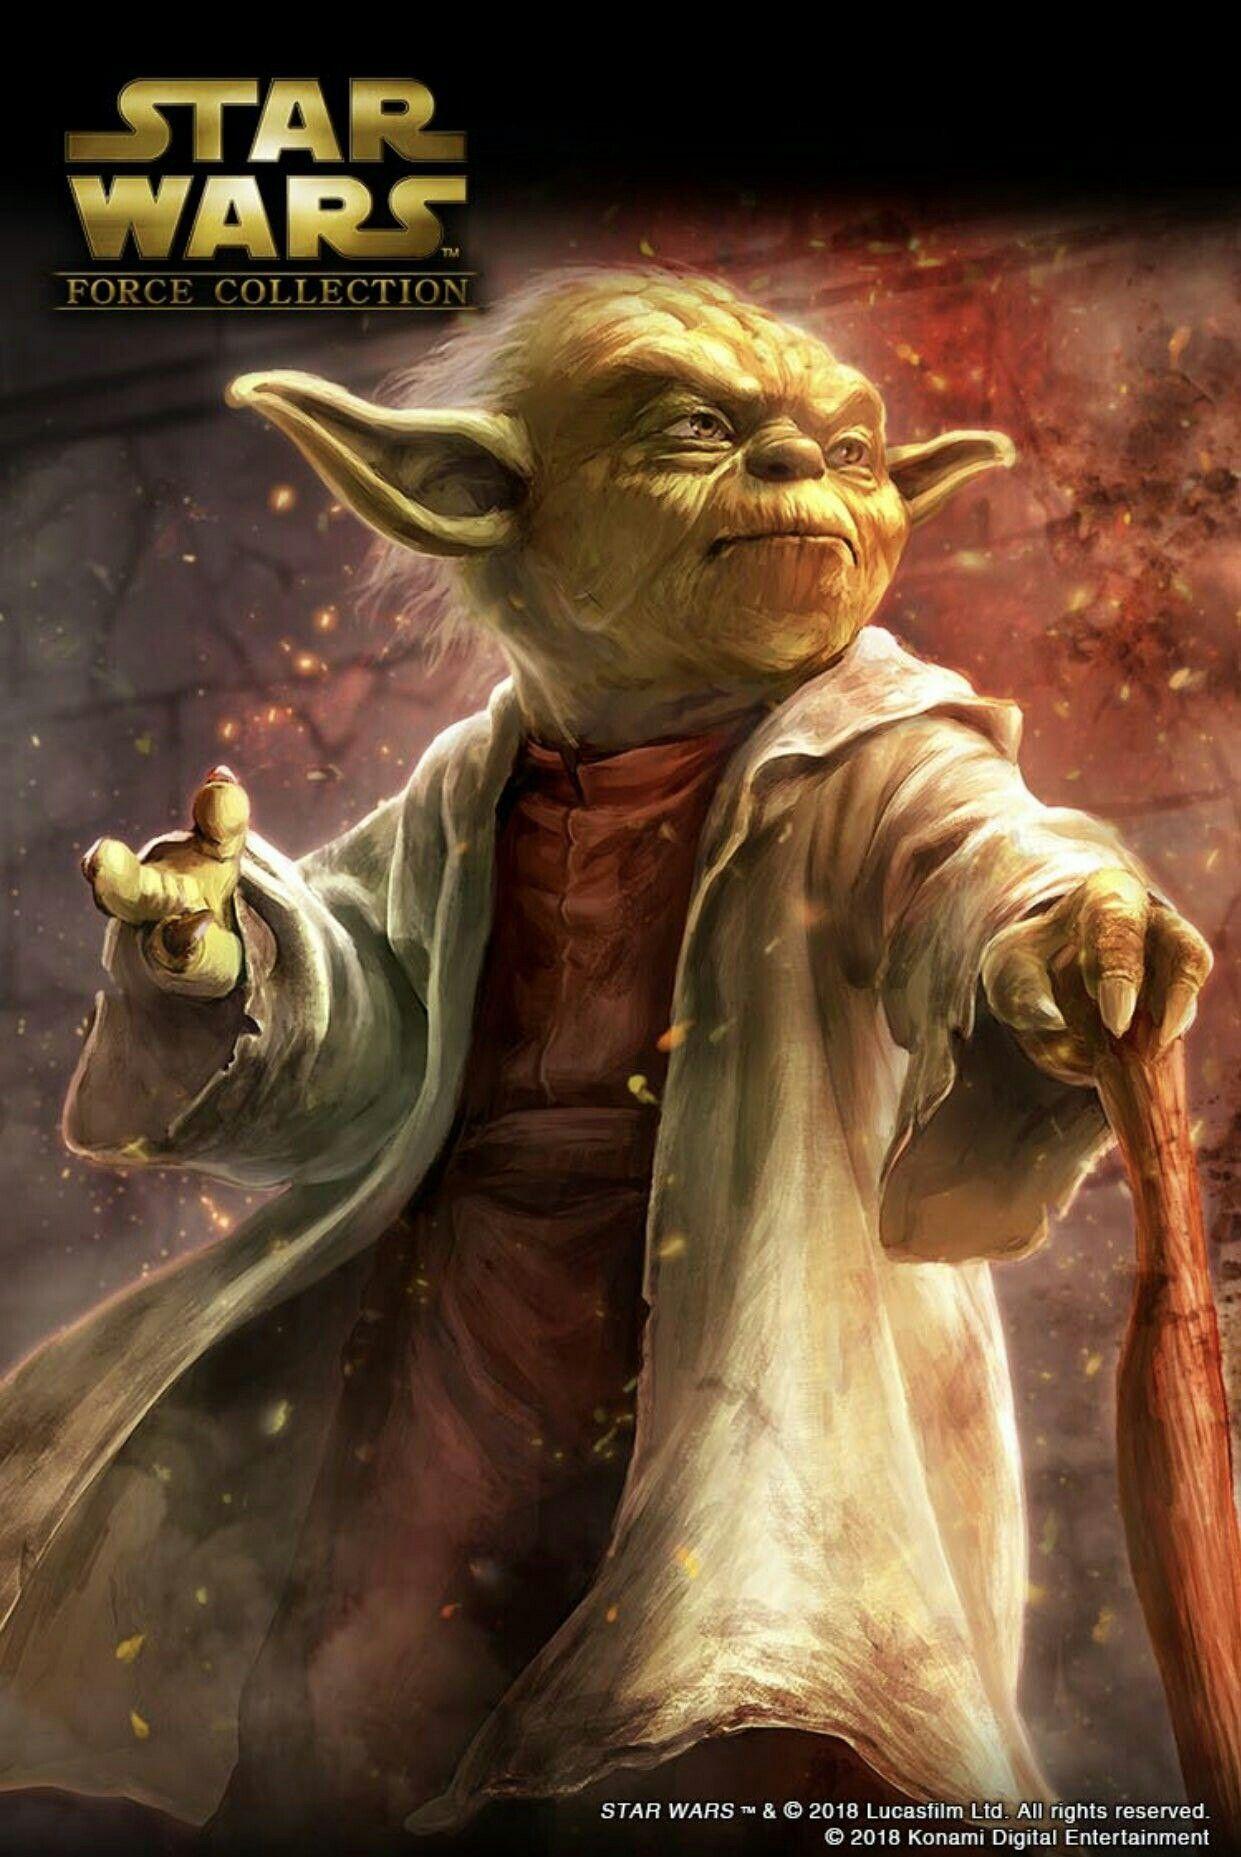 Grand Master Yoda Star Wars Yoda Star Wars Force Collection Star Wars Pictures